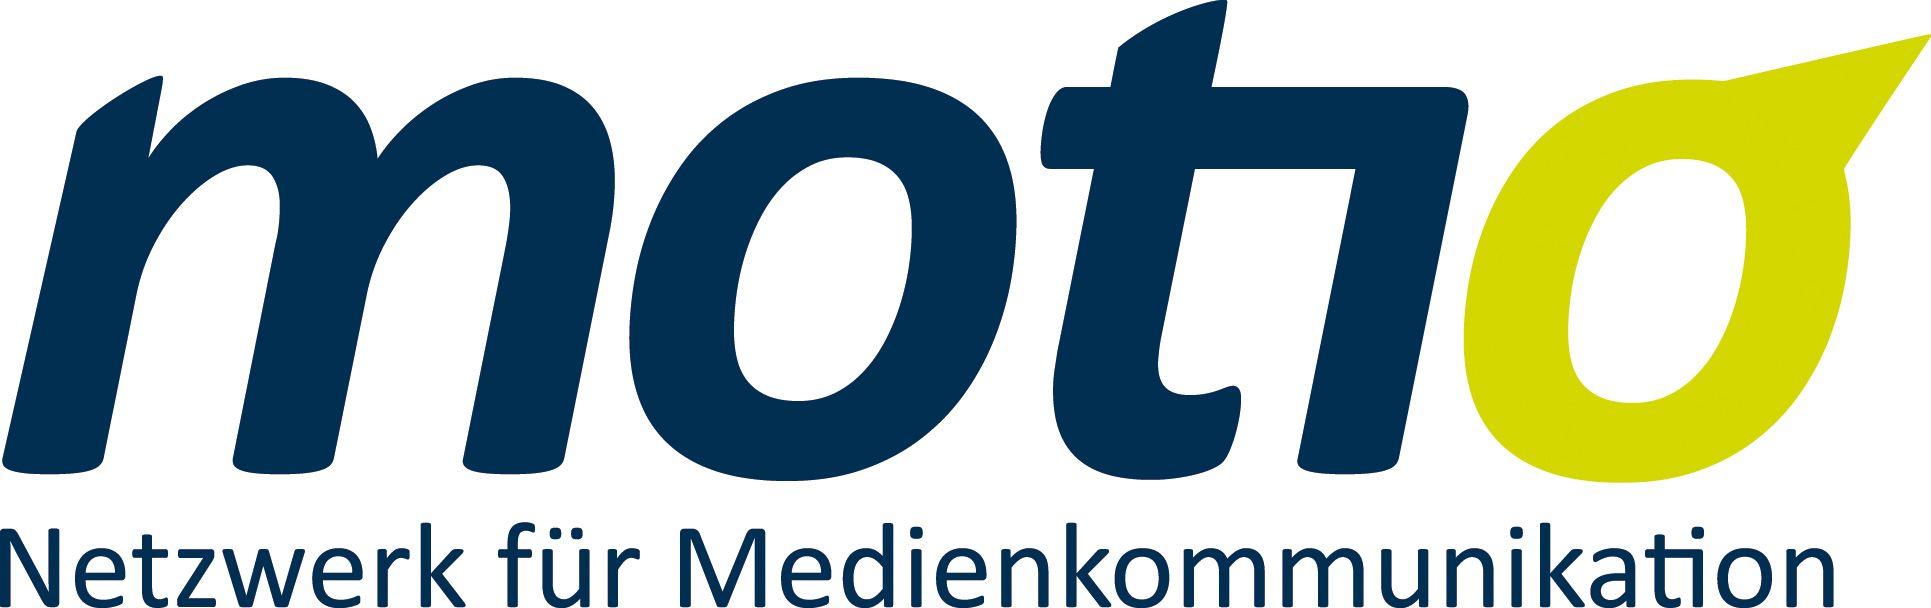 Druck-Verband Motio (Logo: Motio)